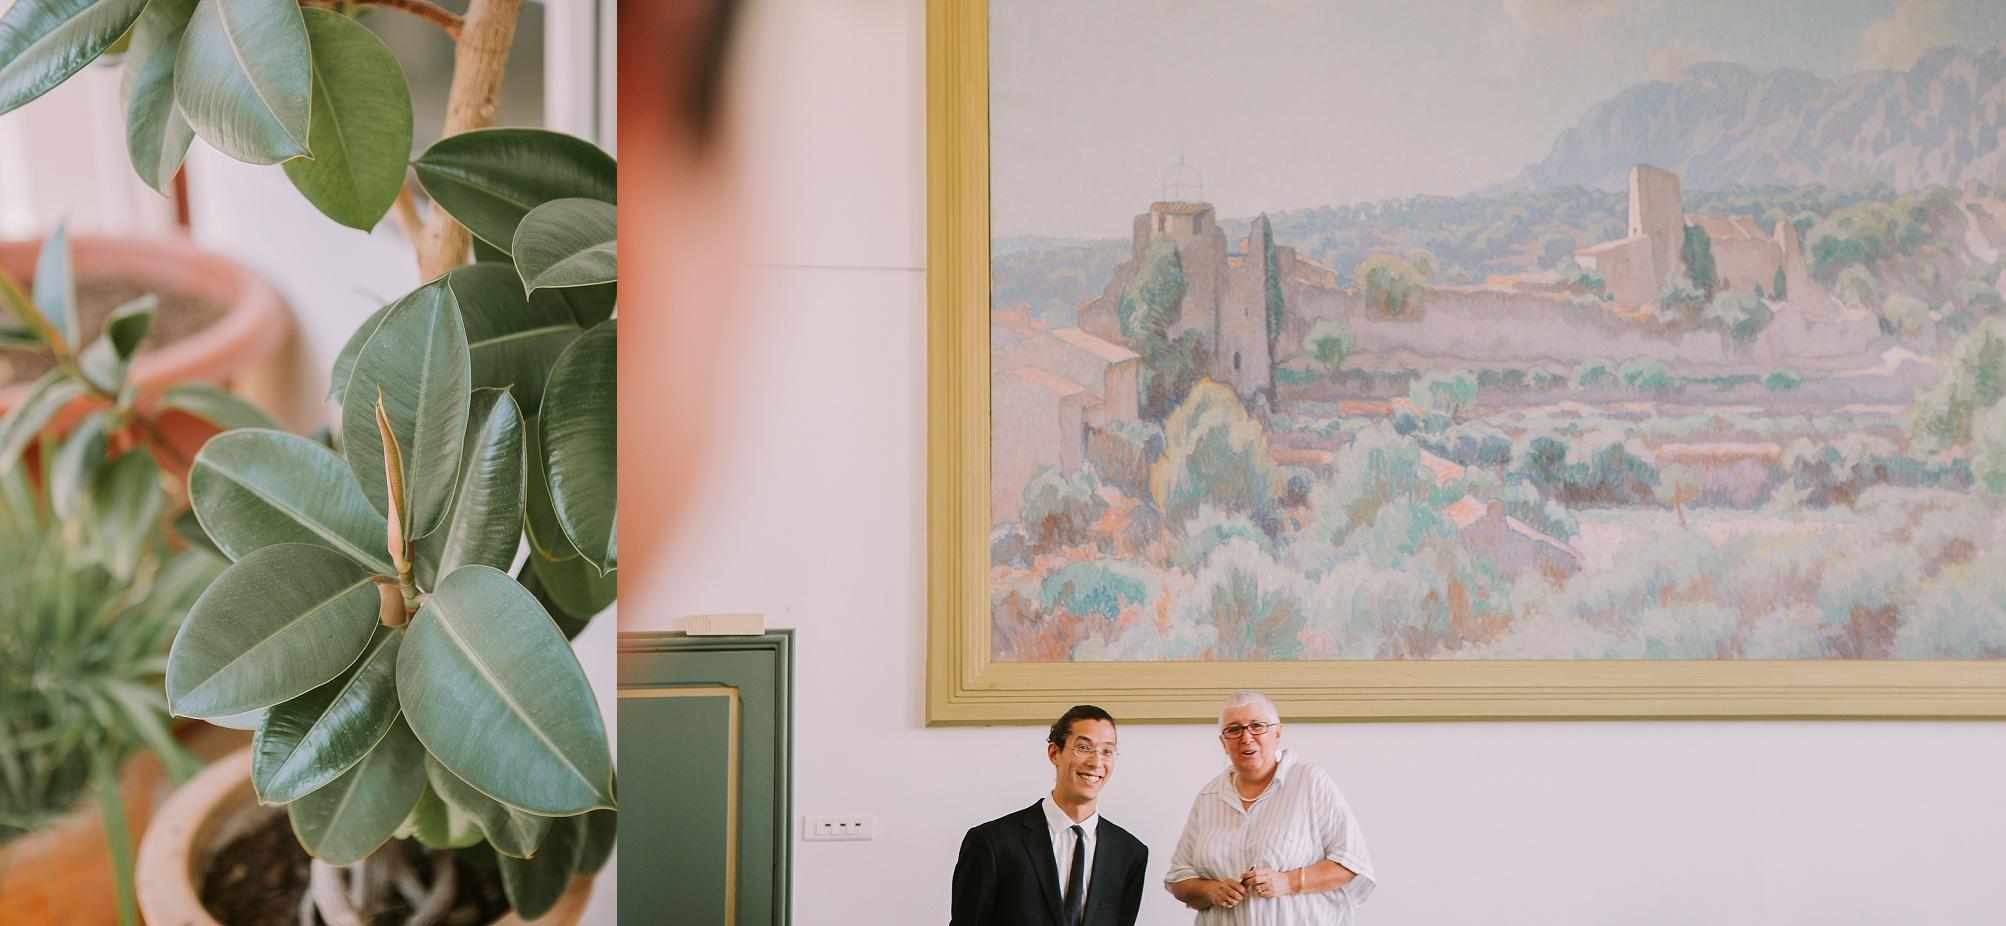 katerynaphotos-mariage-photographe-puyloubier-provence-aix-en-provence-sud-de-la-france_0356.jpg